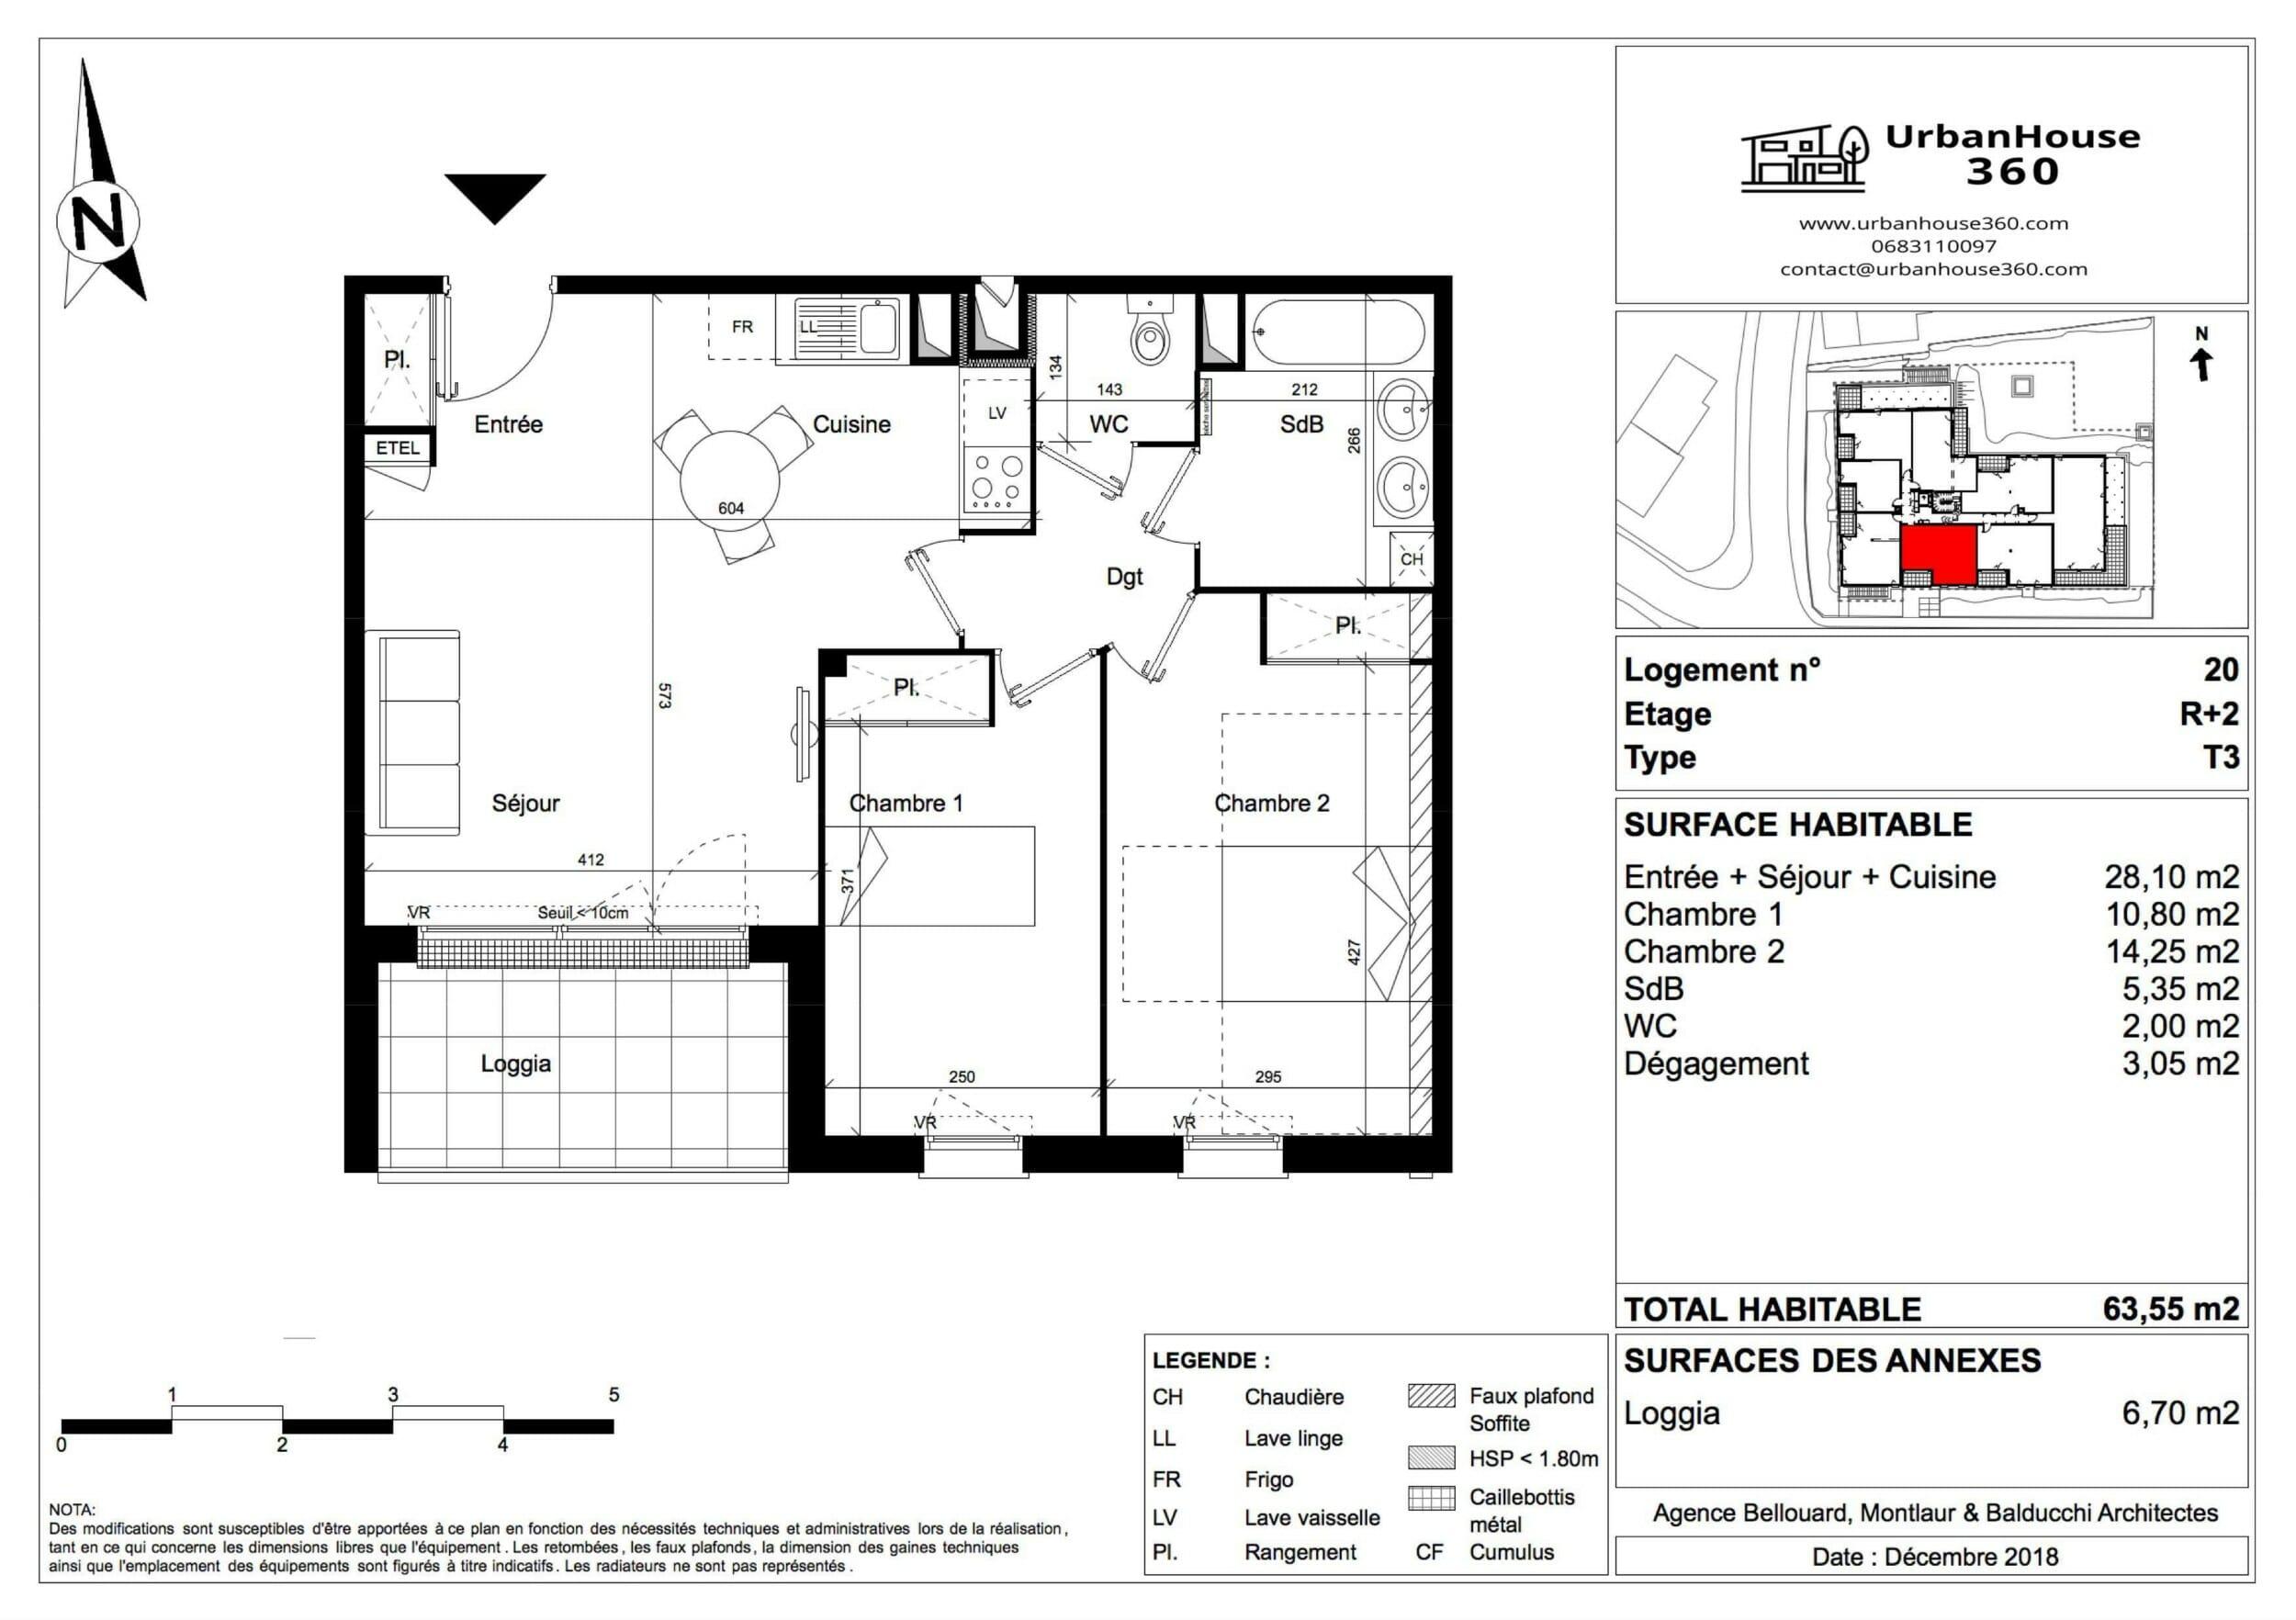 Urbanhouse360-Symphonie-Plan-T3-R+2-20